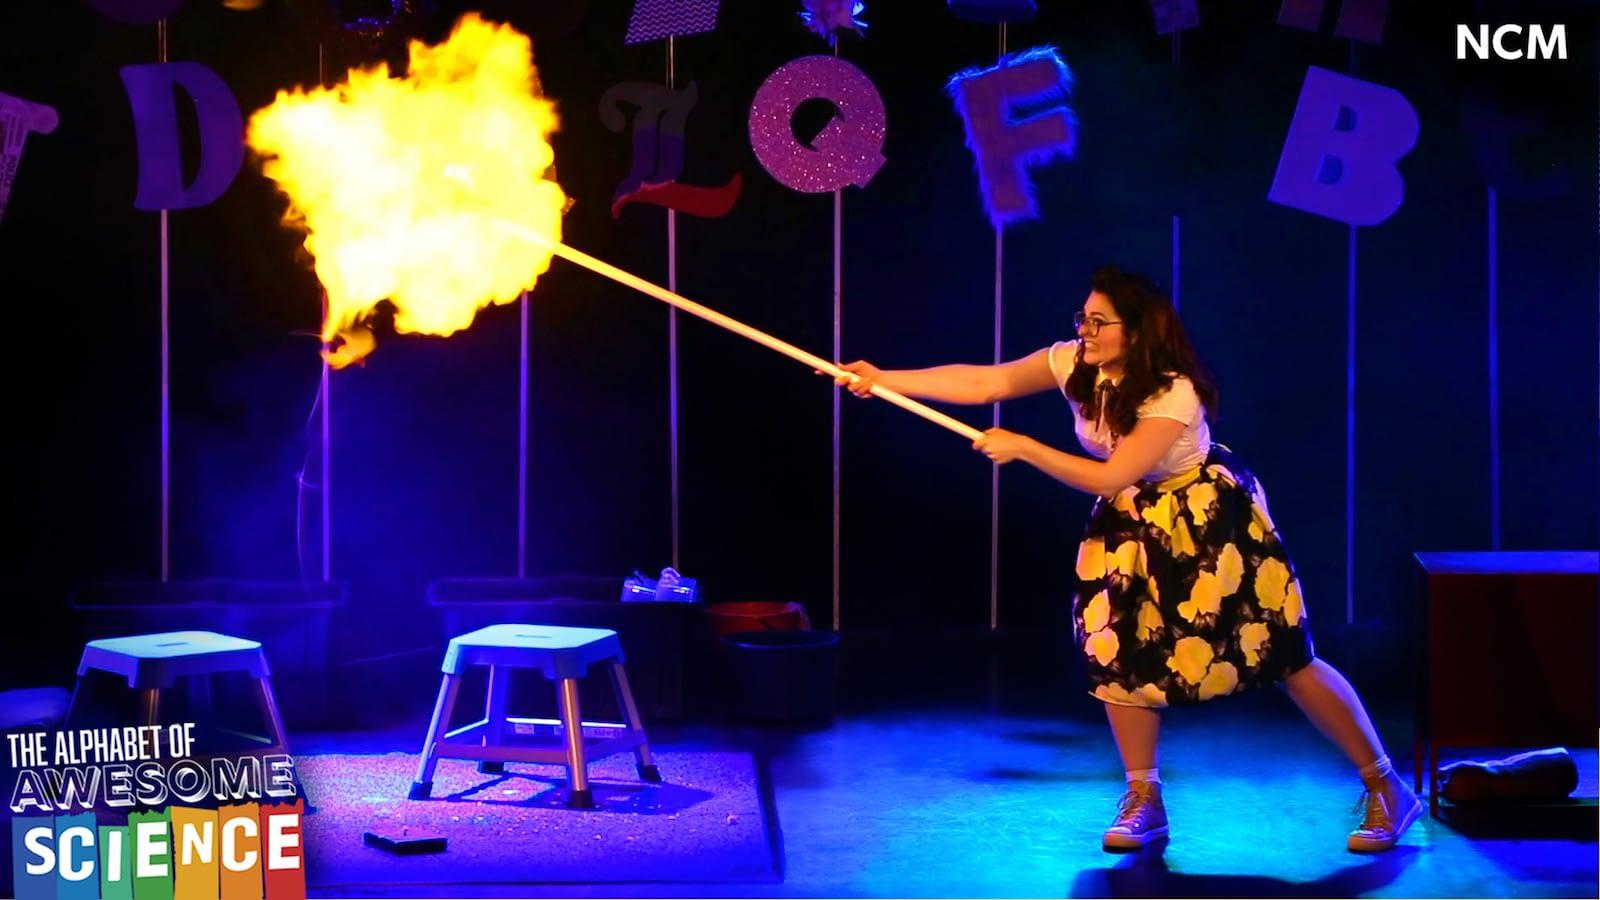 TAOAS---Fireball-Emma-01-1920-X-1080[3] copy